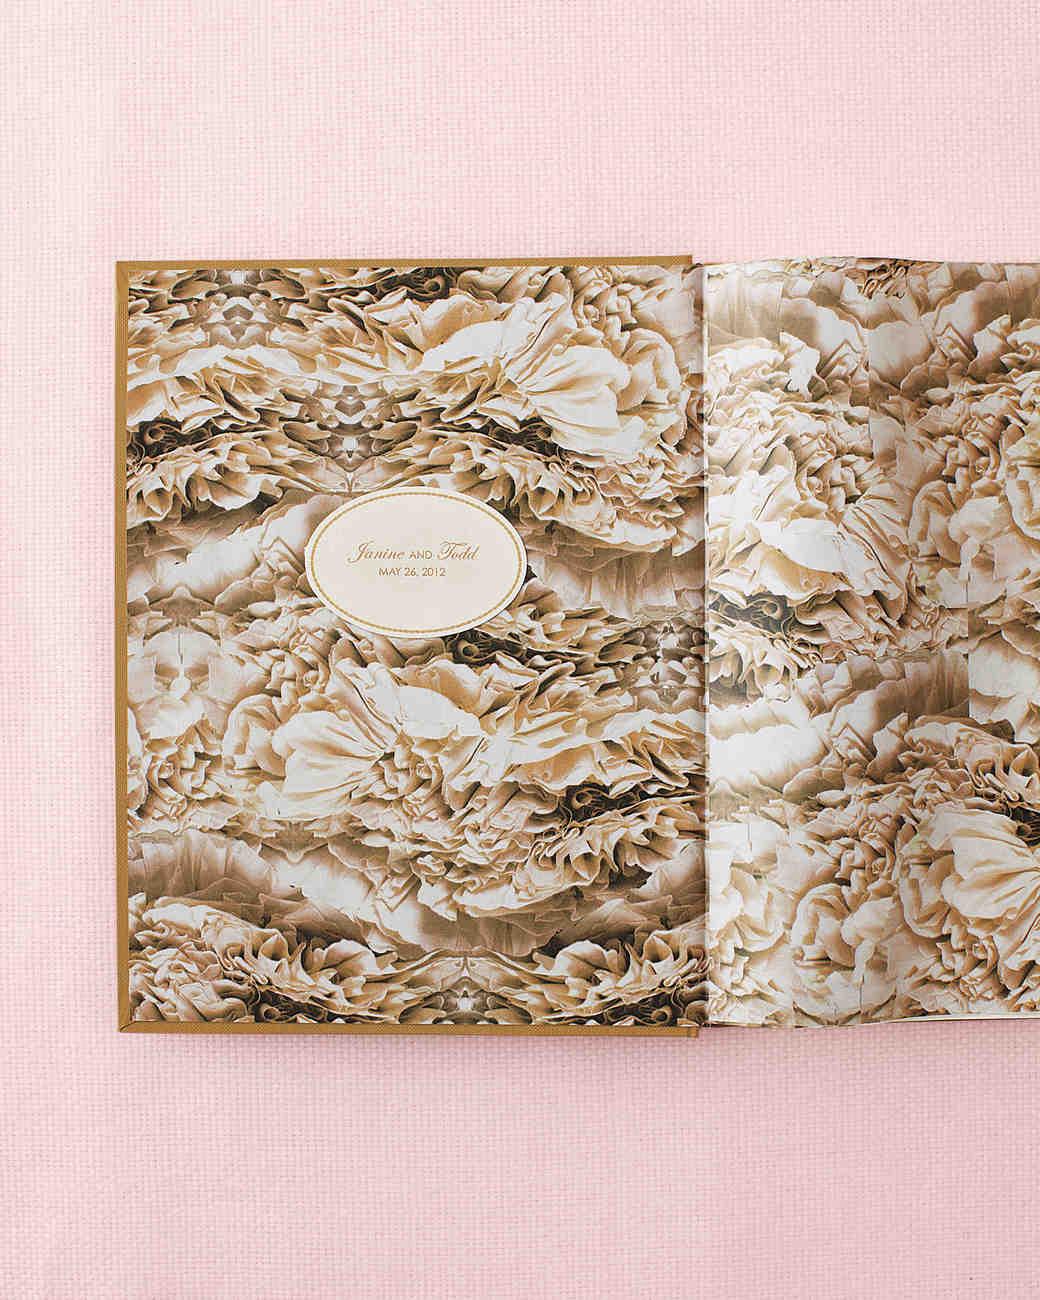 Free Wedding Invitation Books - Oval guest book label